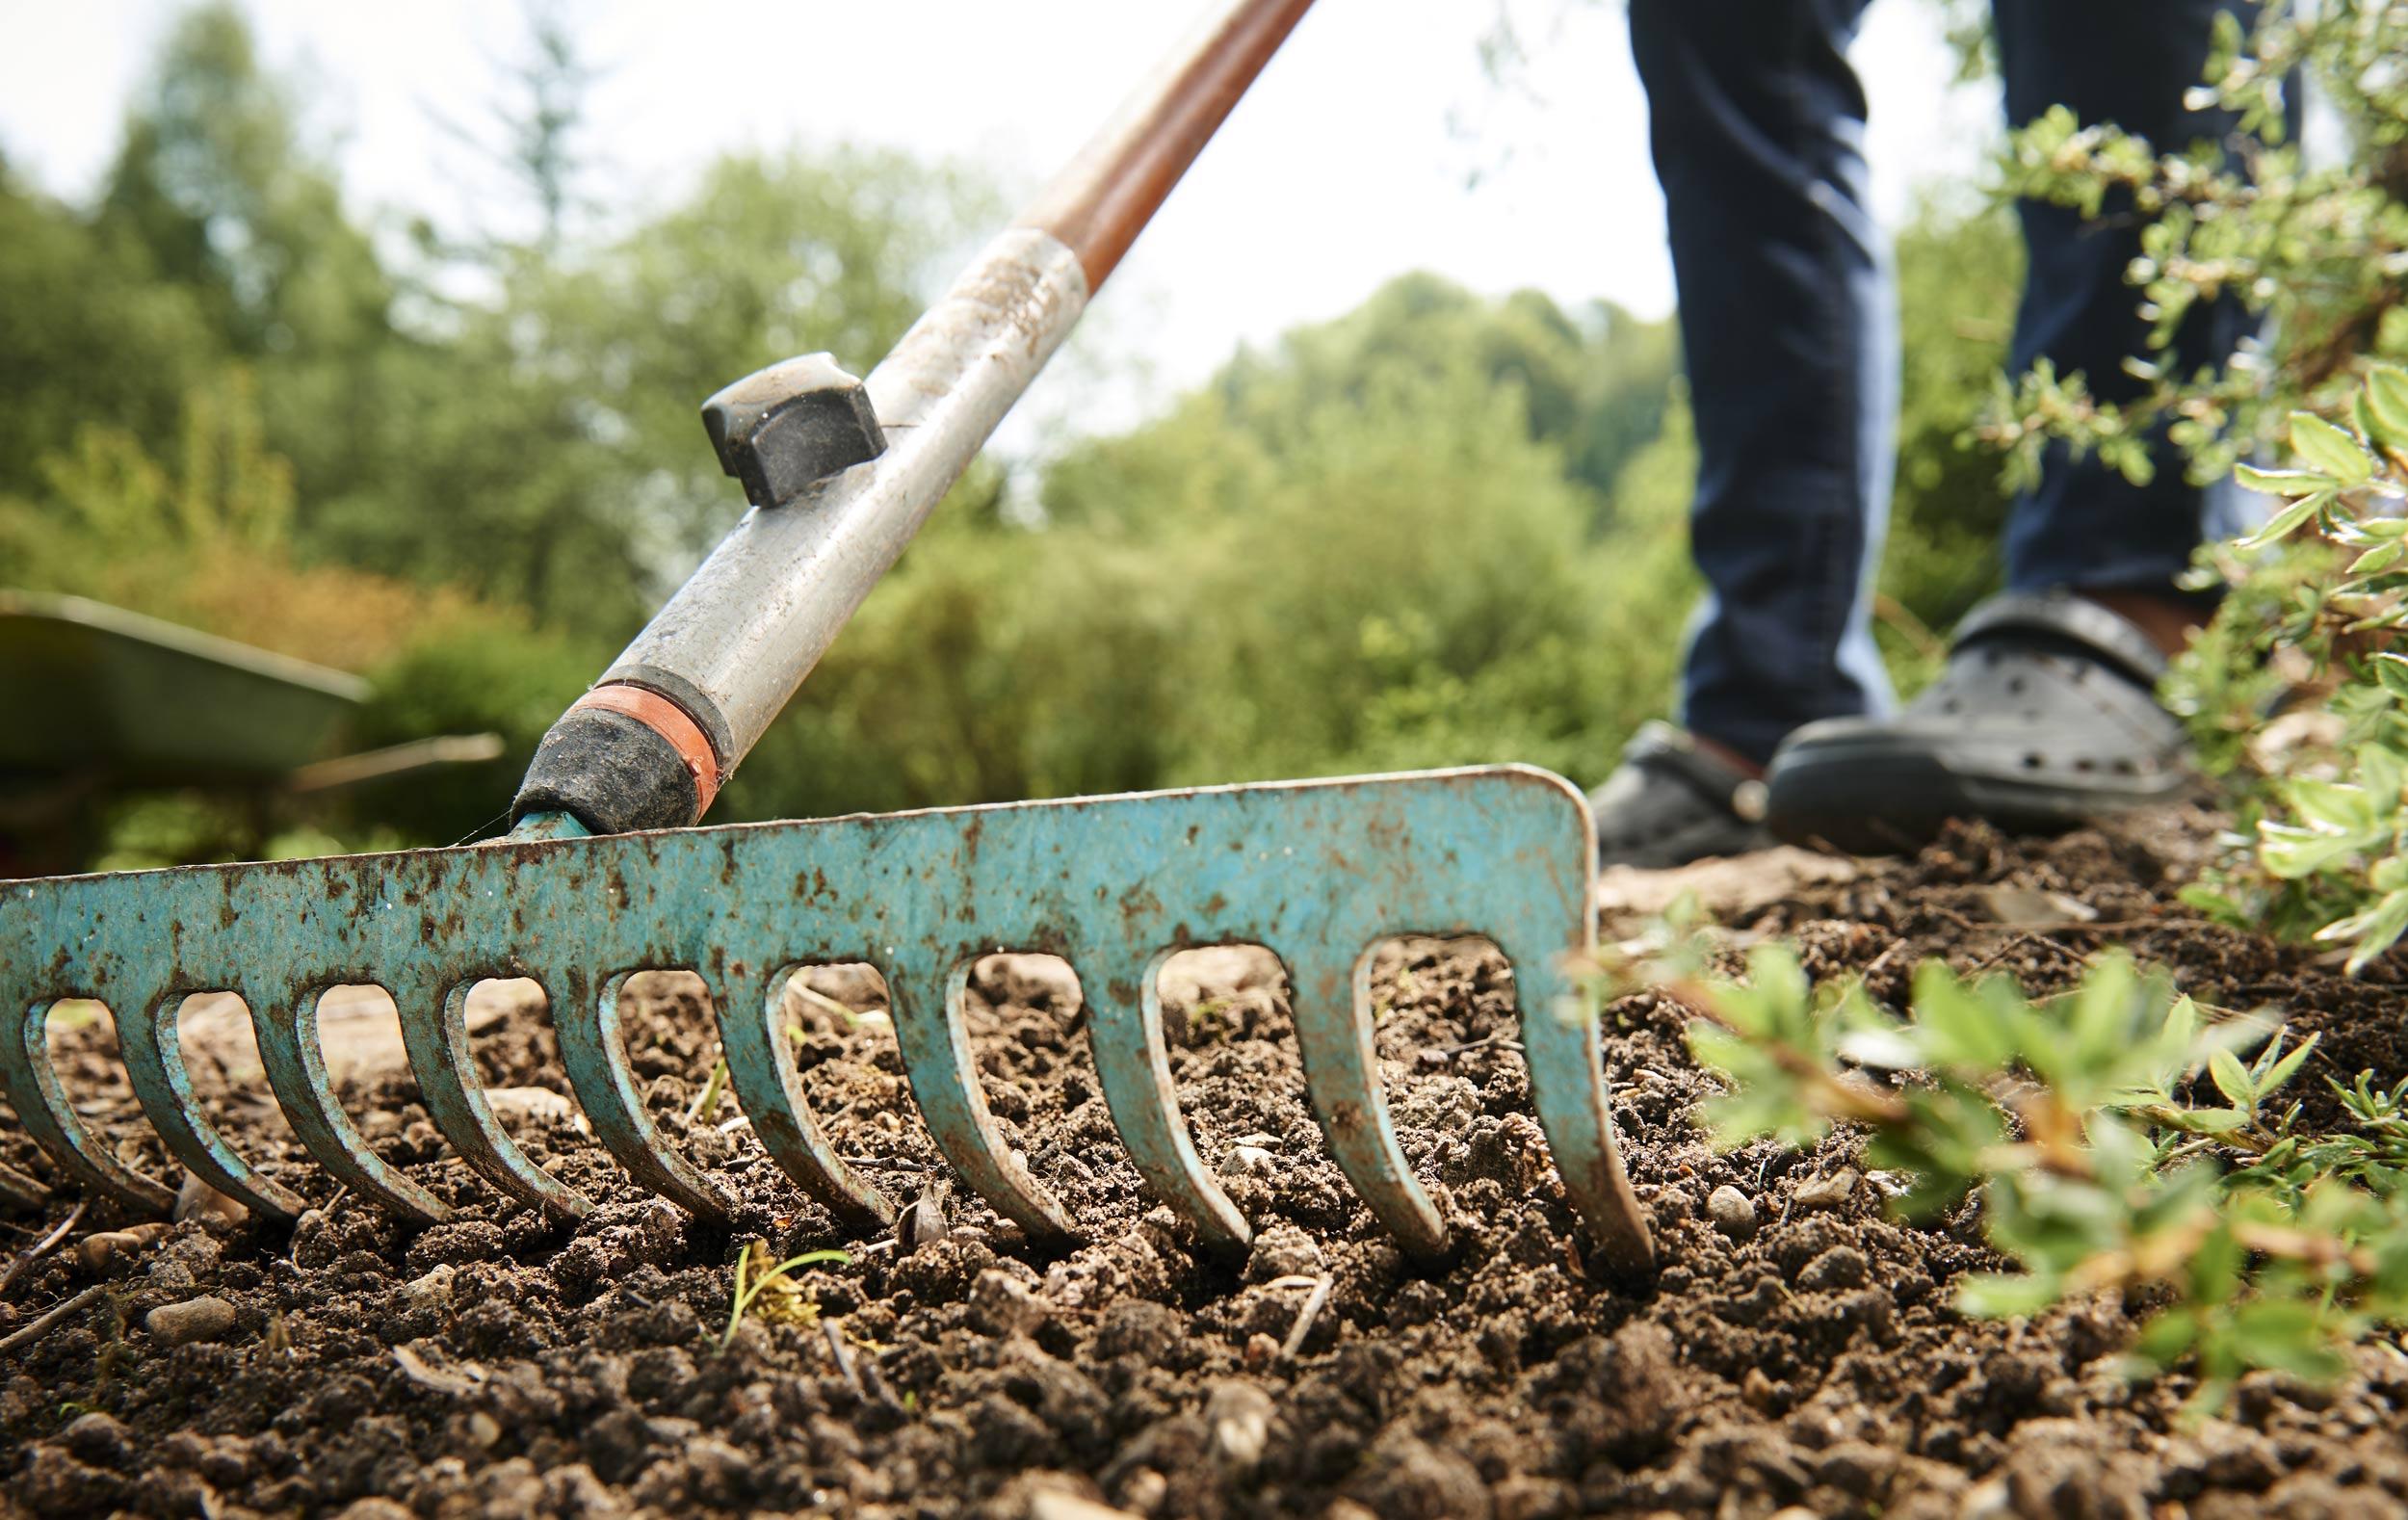 RHS Level 3 Certificate in Practical Horticulture